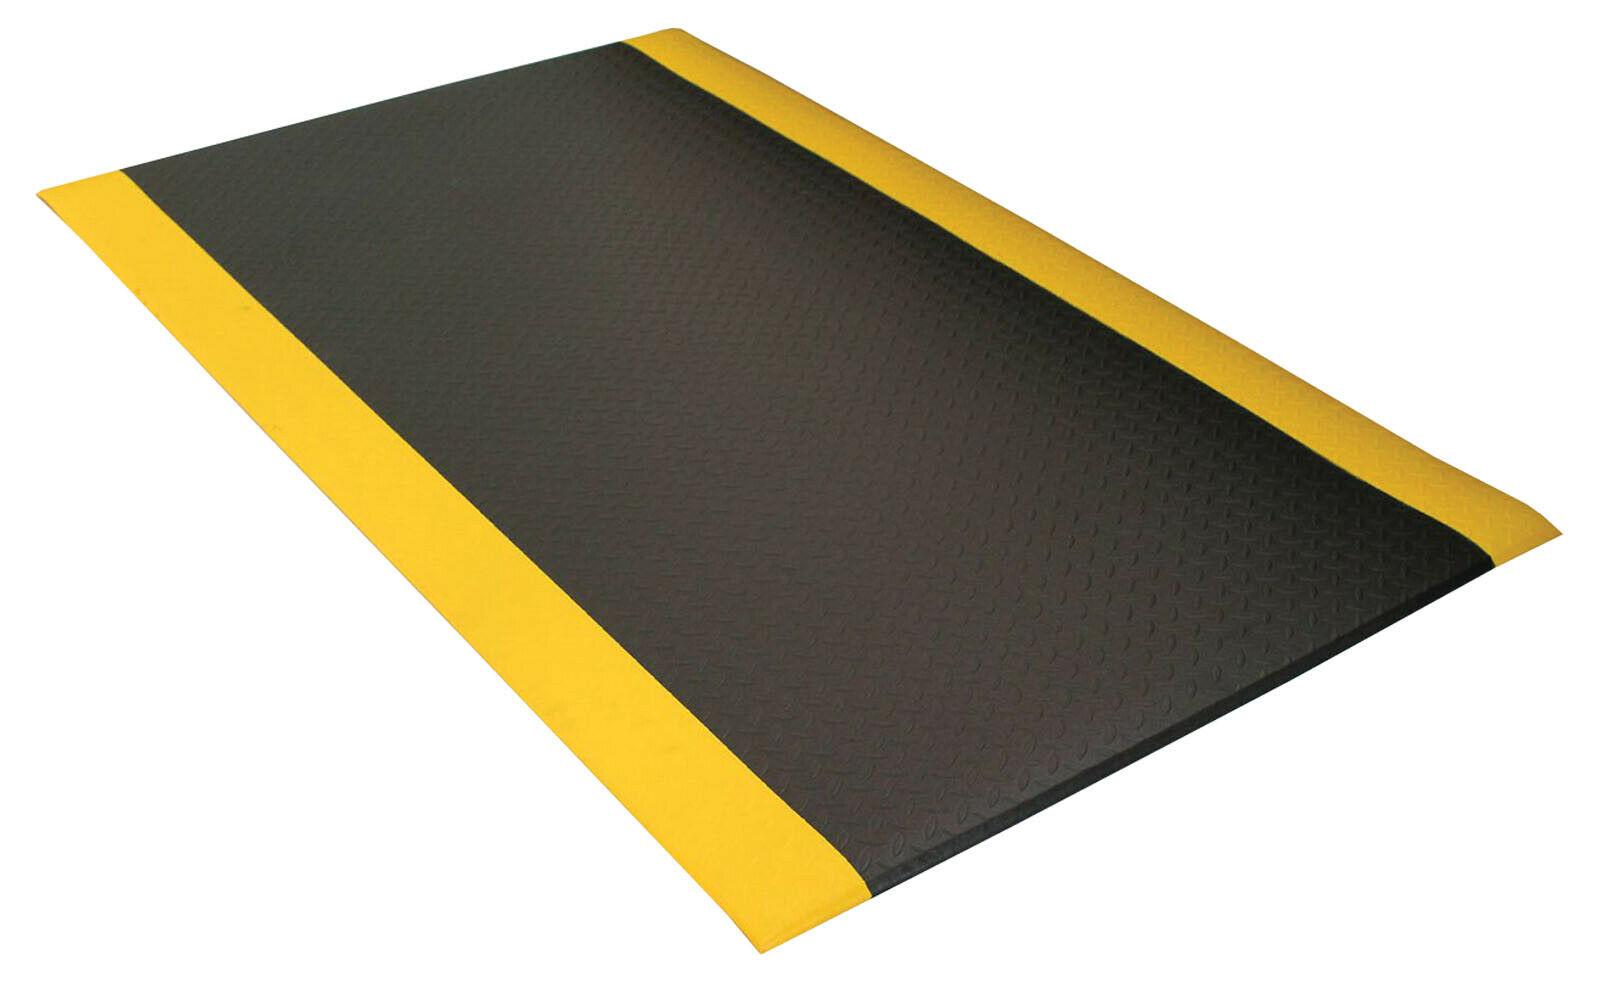 PFM-1 900mm x 1500mm Large Industrial Foam Workstation Anti Fatigue Safety Mat